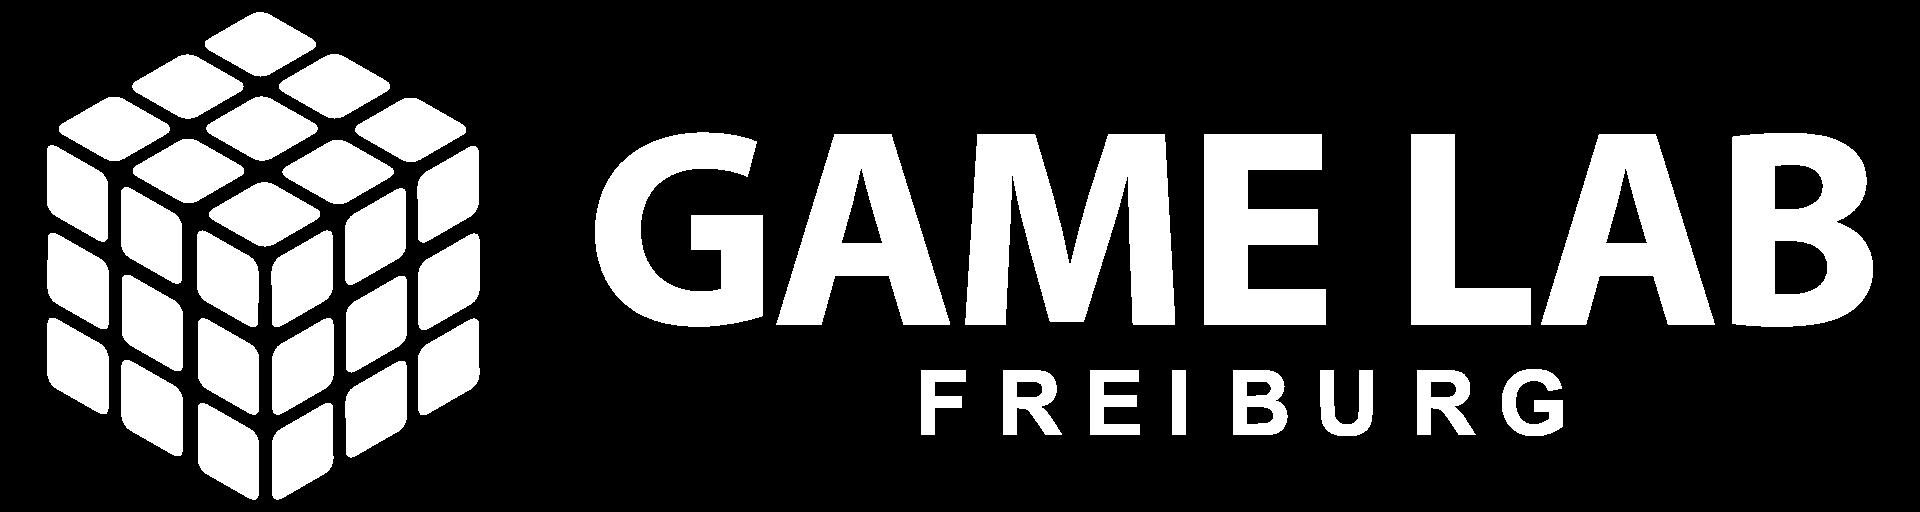 GameLab Freiburg